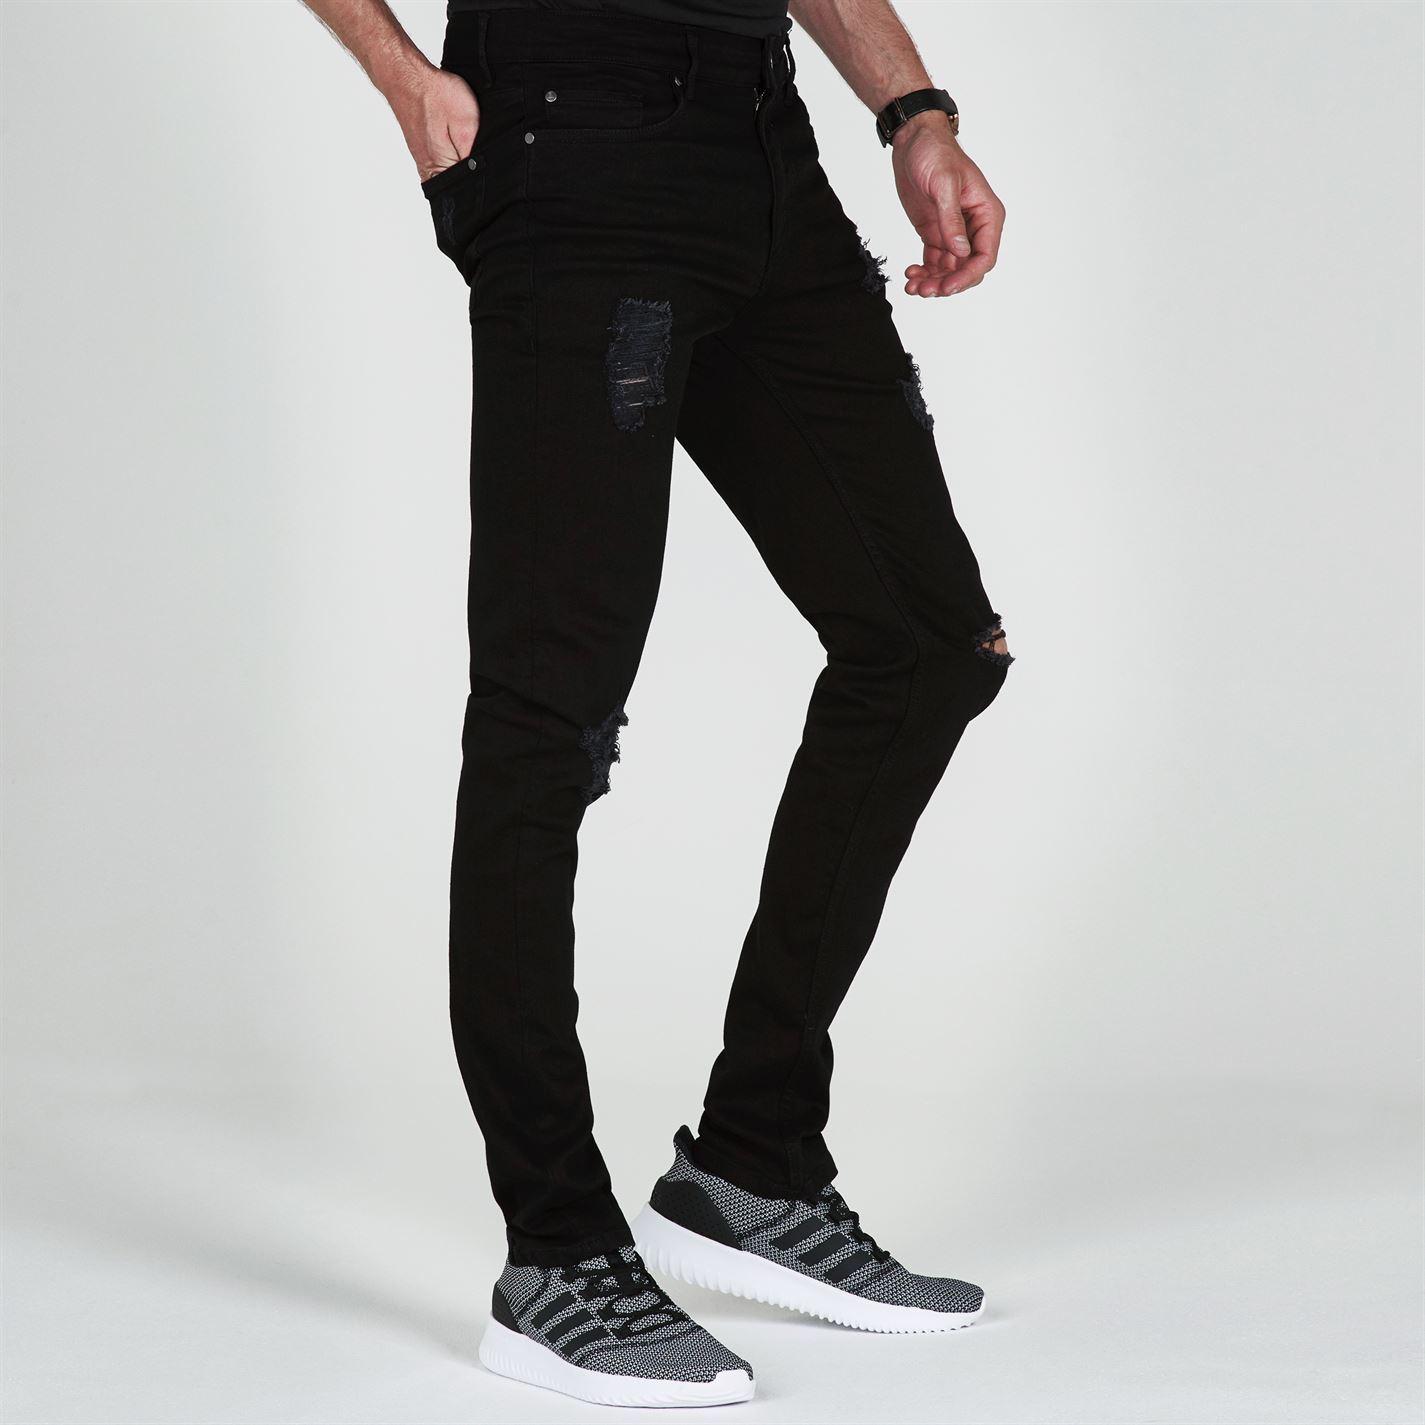 Jeans-Denim-Firetrap-Skinny-Mens-Trouser-Pants-Black thumbnail 9